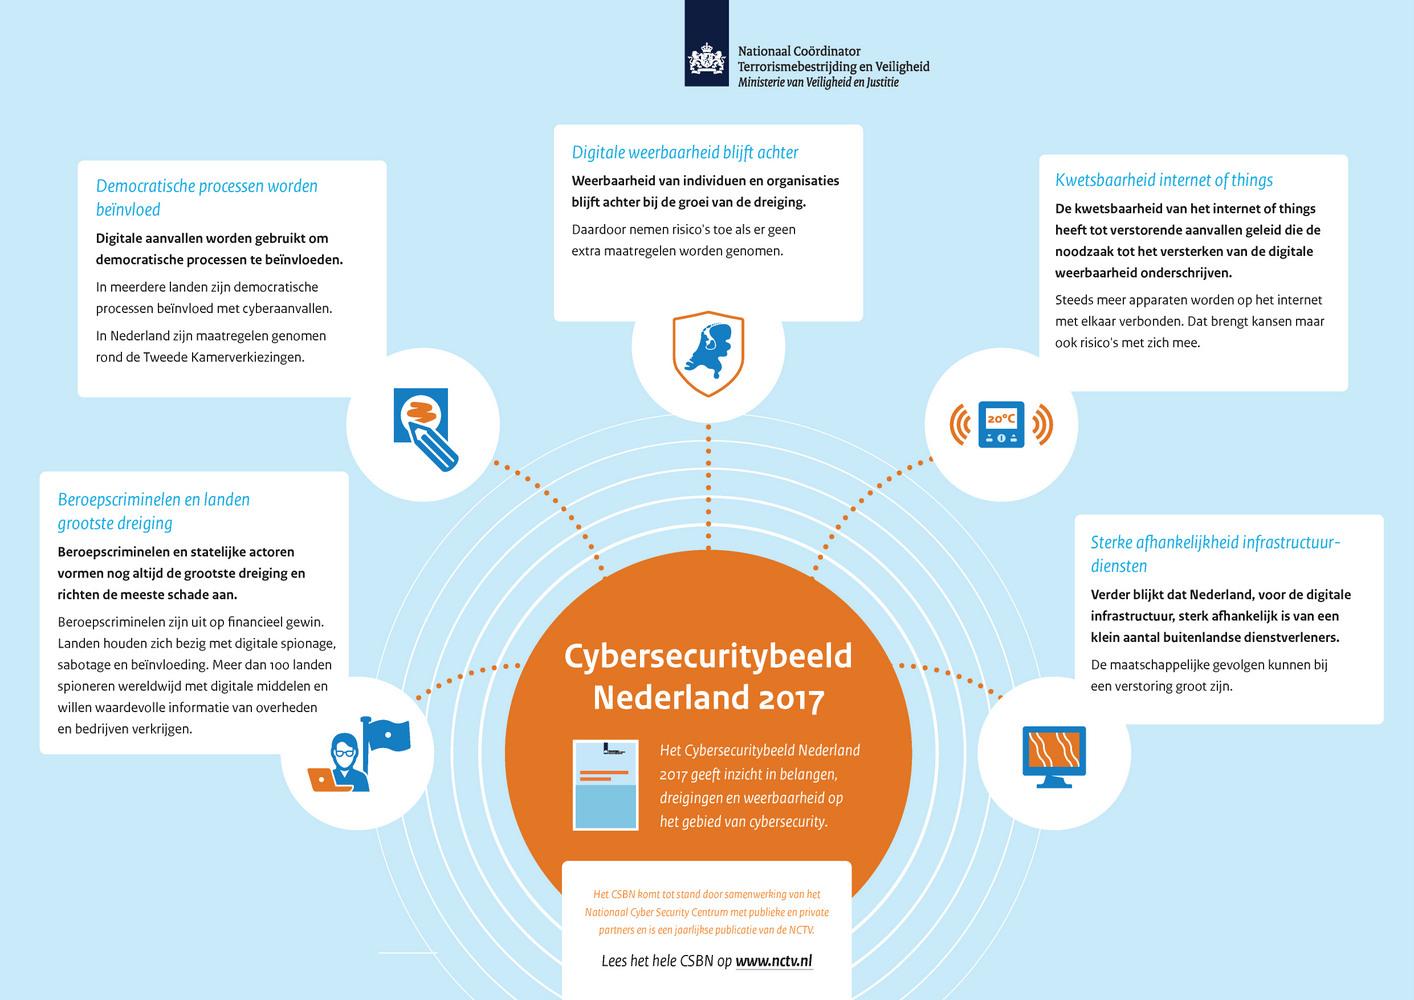 cybersecuritybeeld-nederland infographic